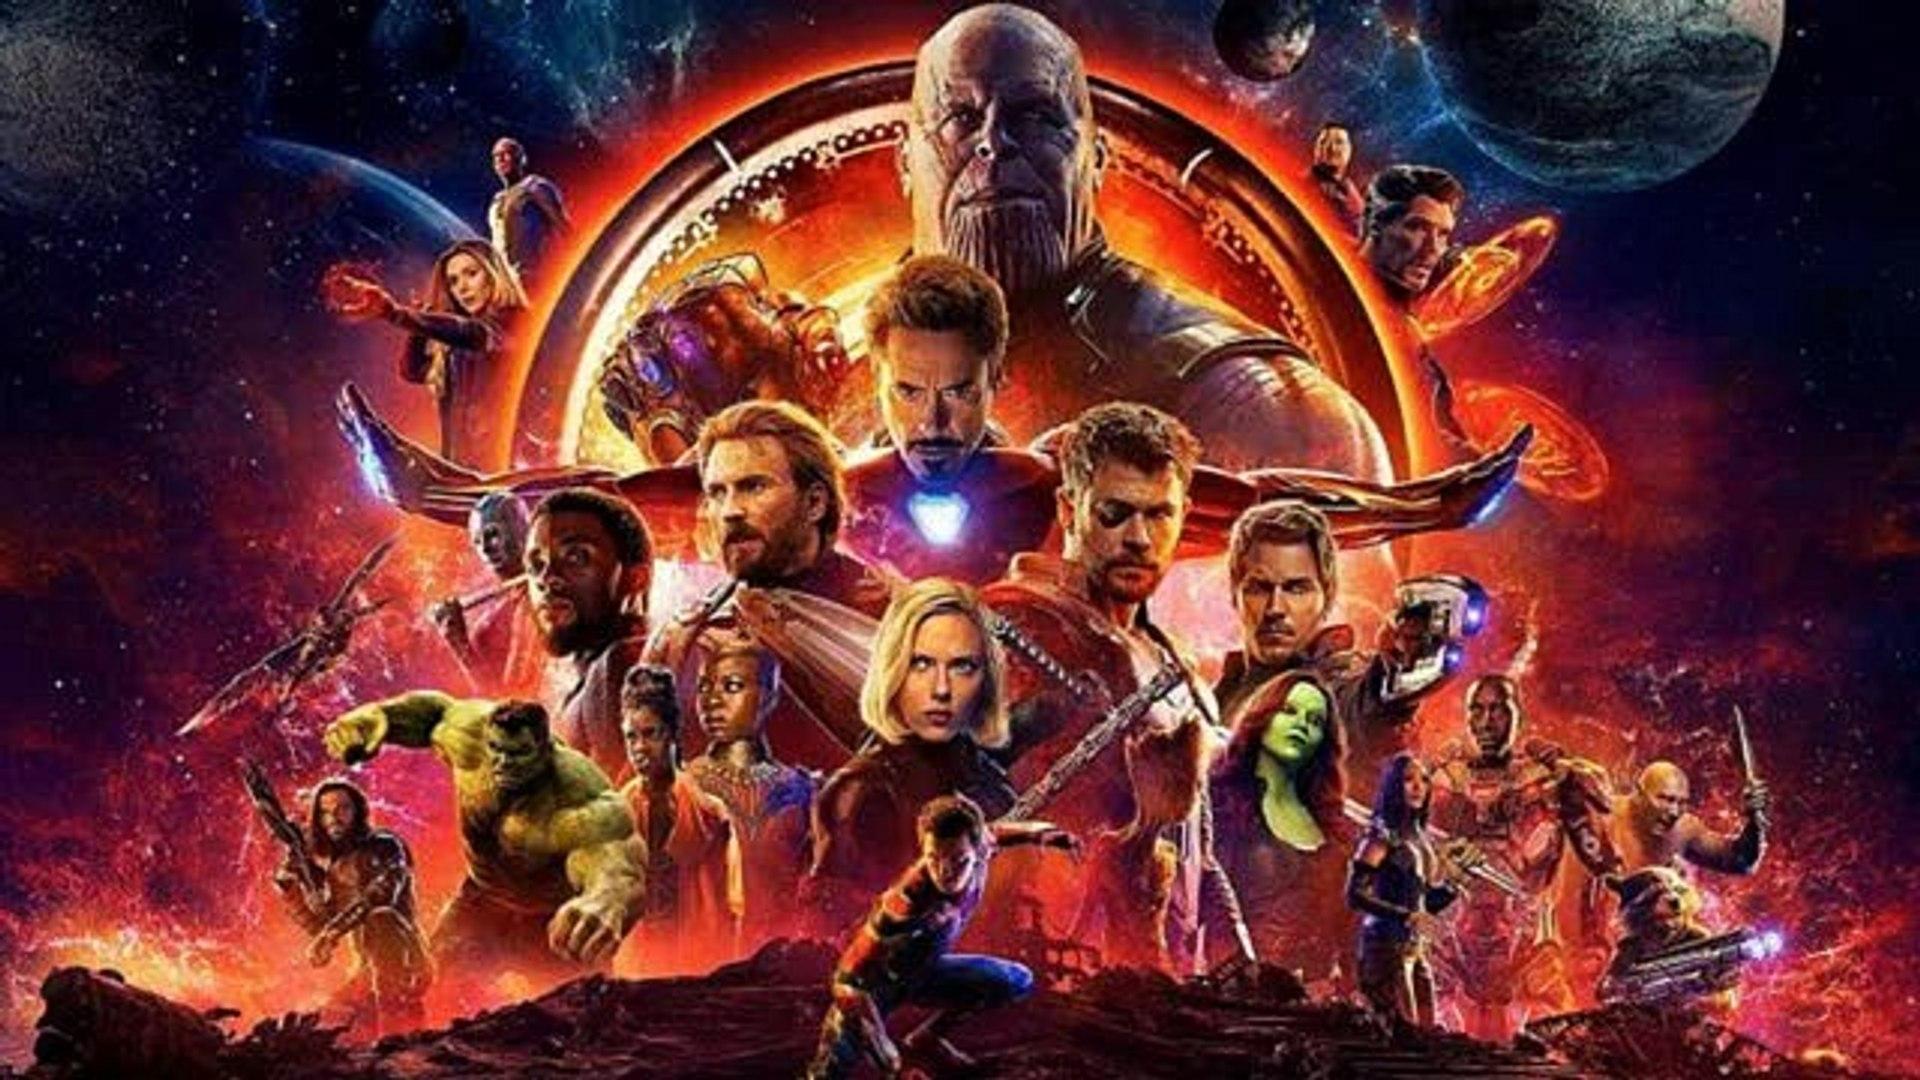 ✼✼ Avengers Infinity War (2018) English Film Free✱ FULL NEW★ MOVIE